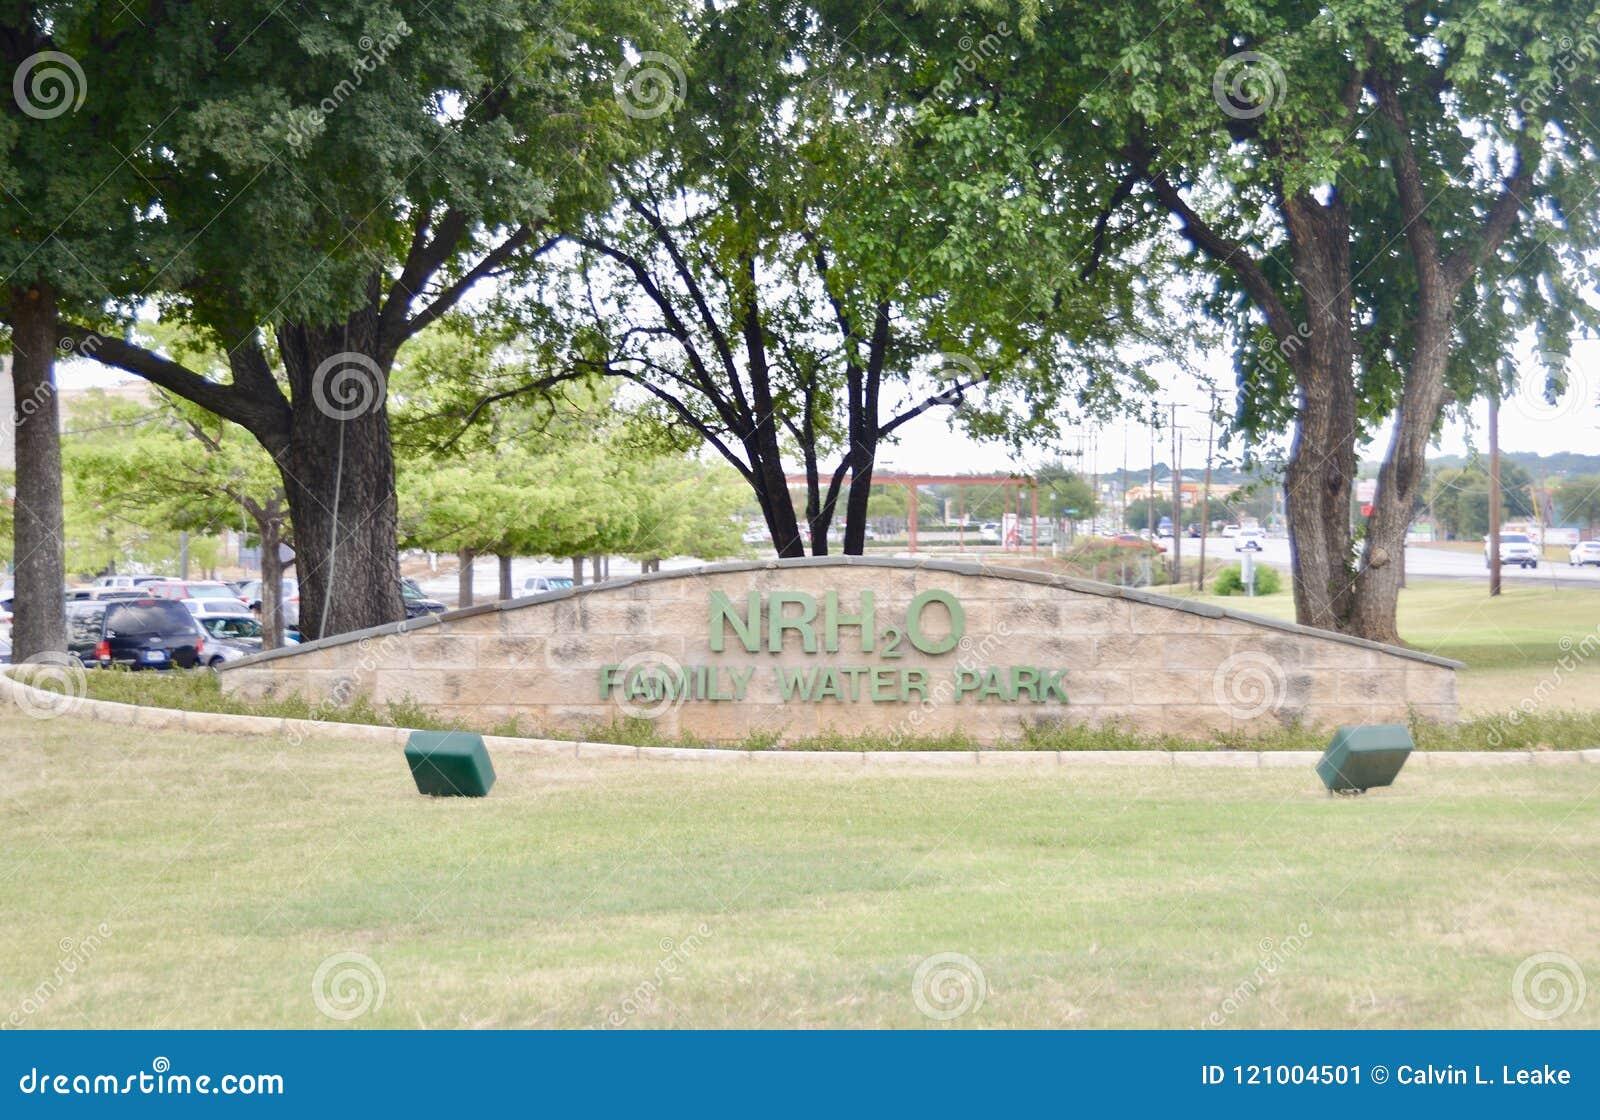 NRH2O Water Park, North Richland Hills, Texas Editorial